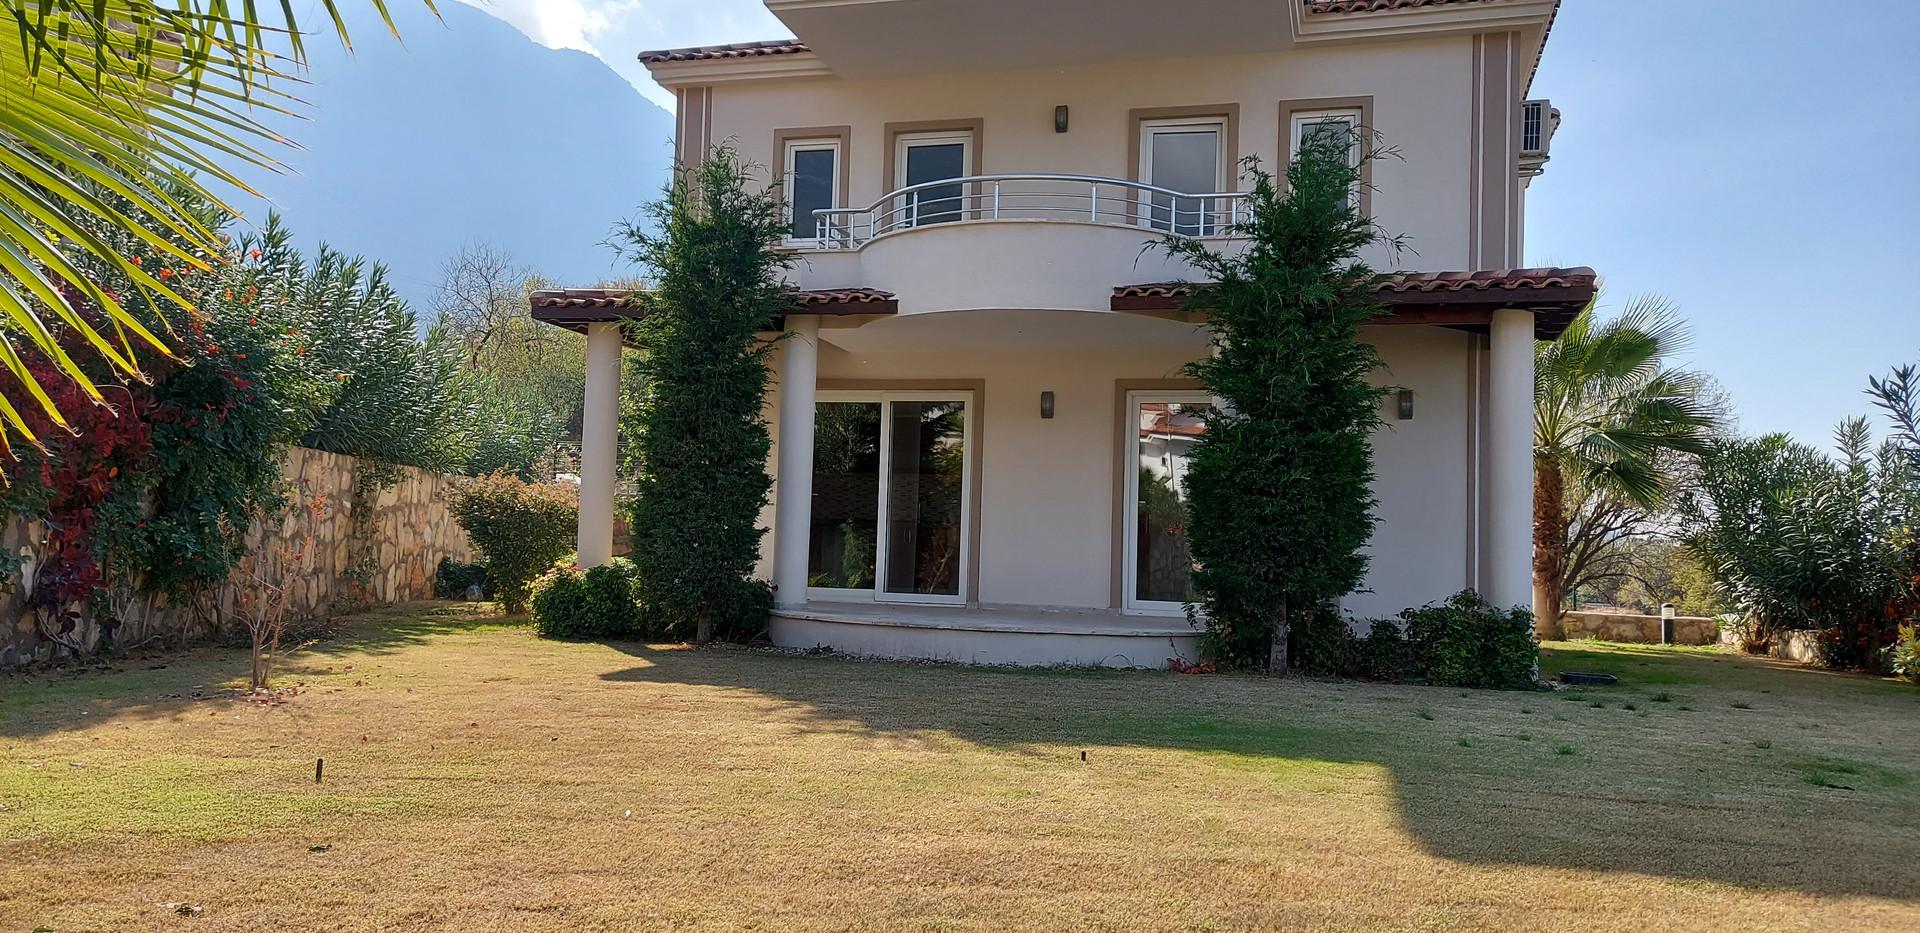 Detached Villa, Private Garden